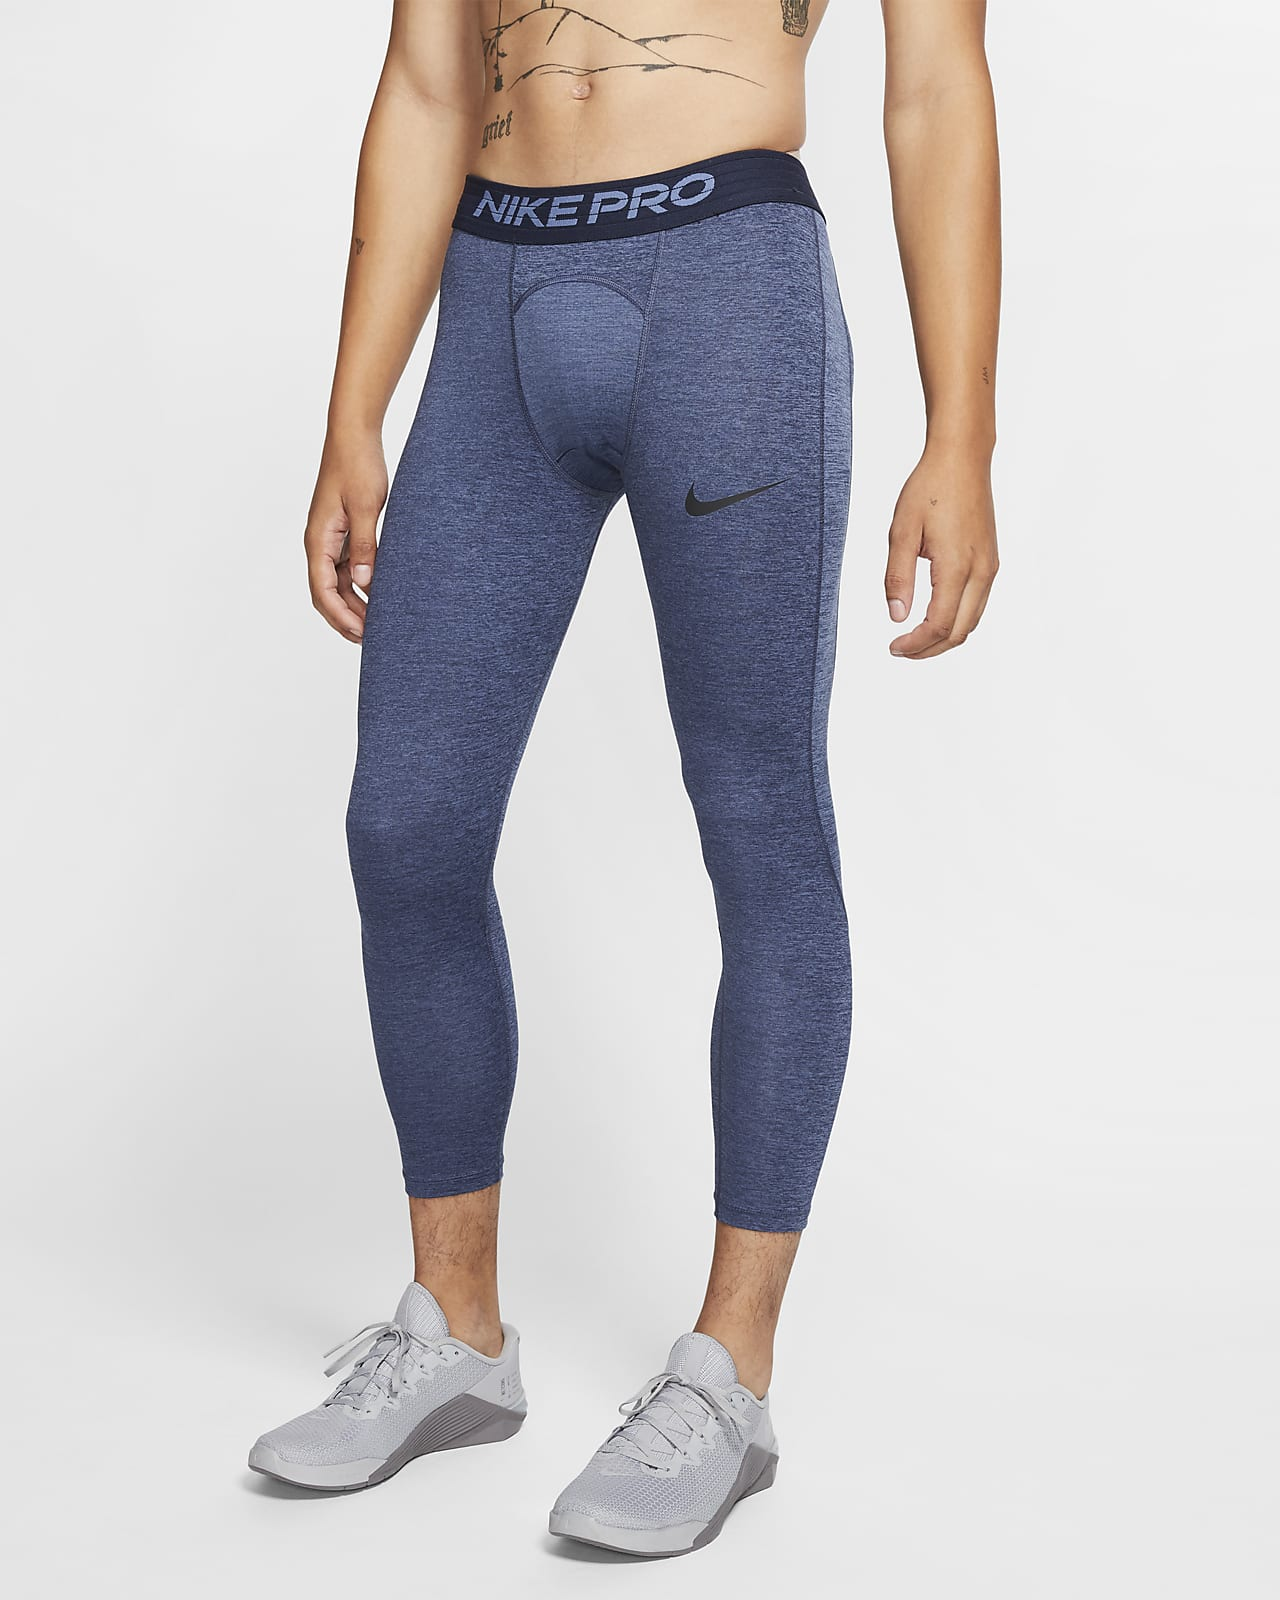 Mallas De Tres Cuartos Para Hombre Nike Pro Nike Com